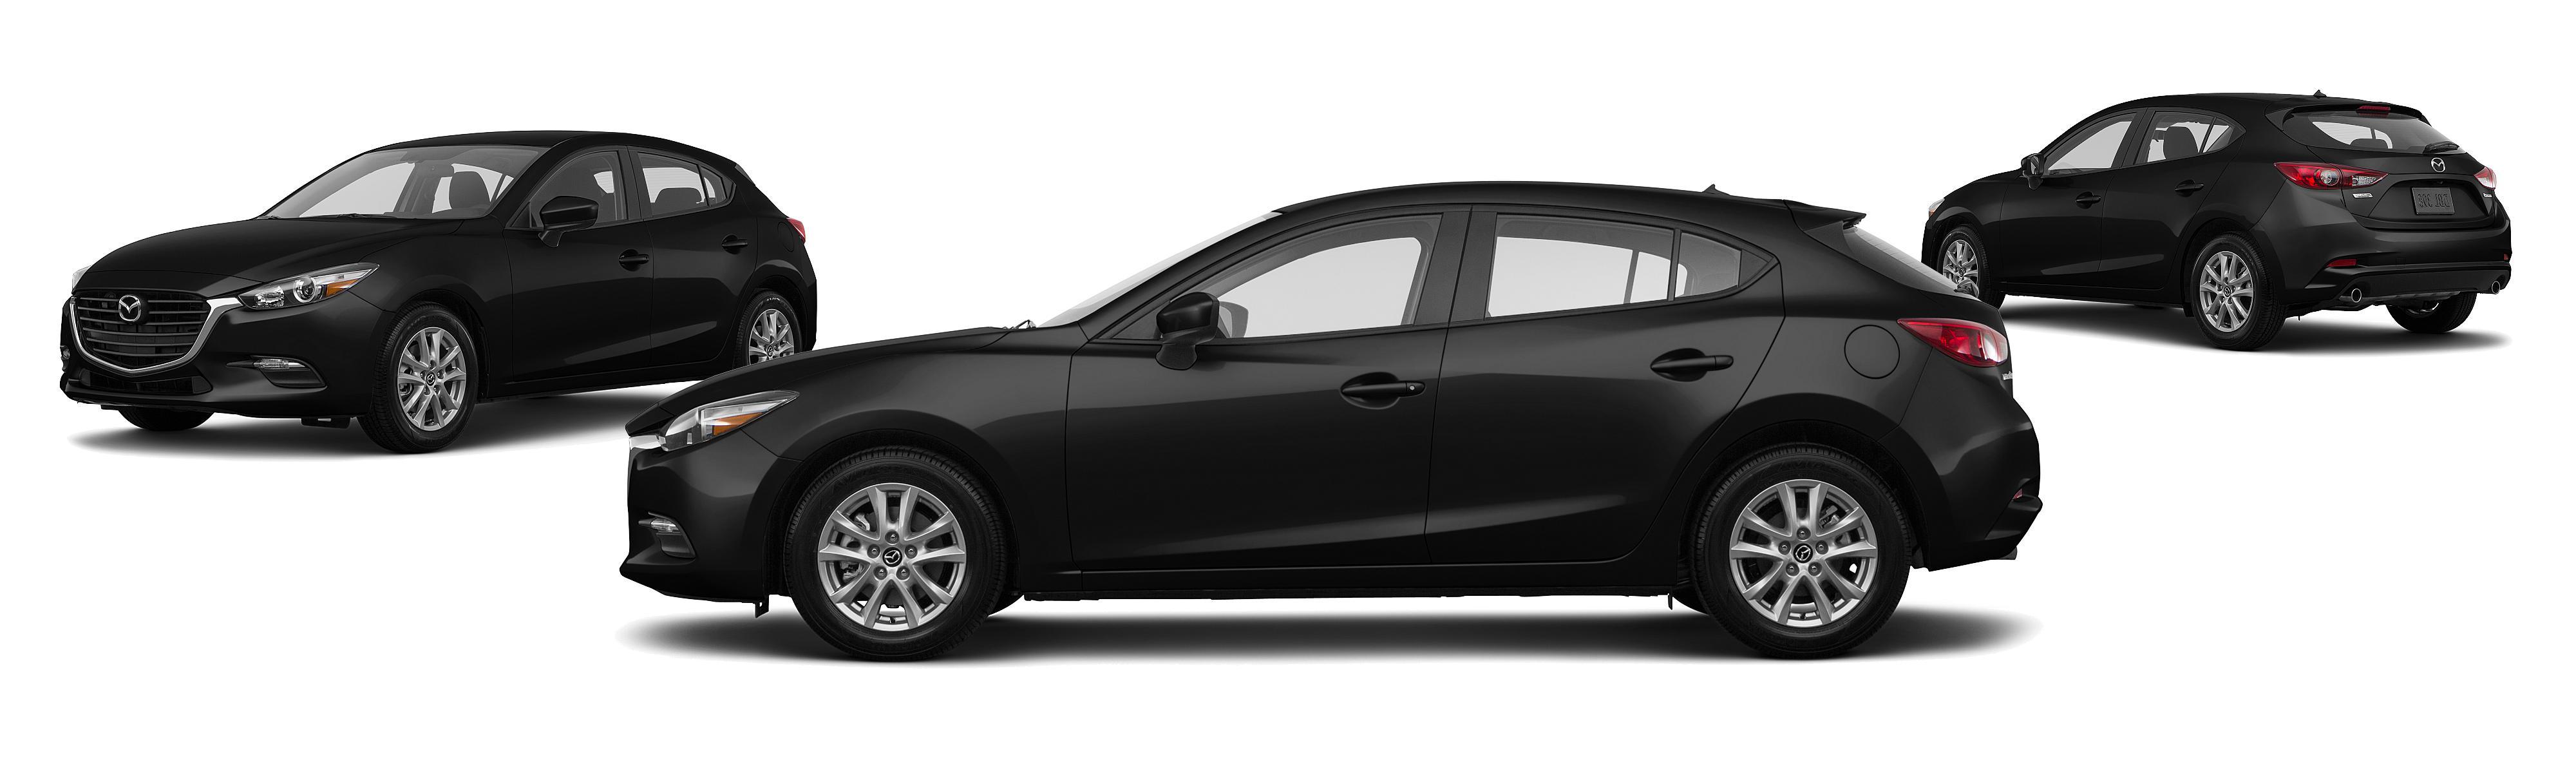 Mazda 3 Hatchback Html Autos Weblog